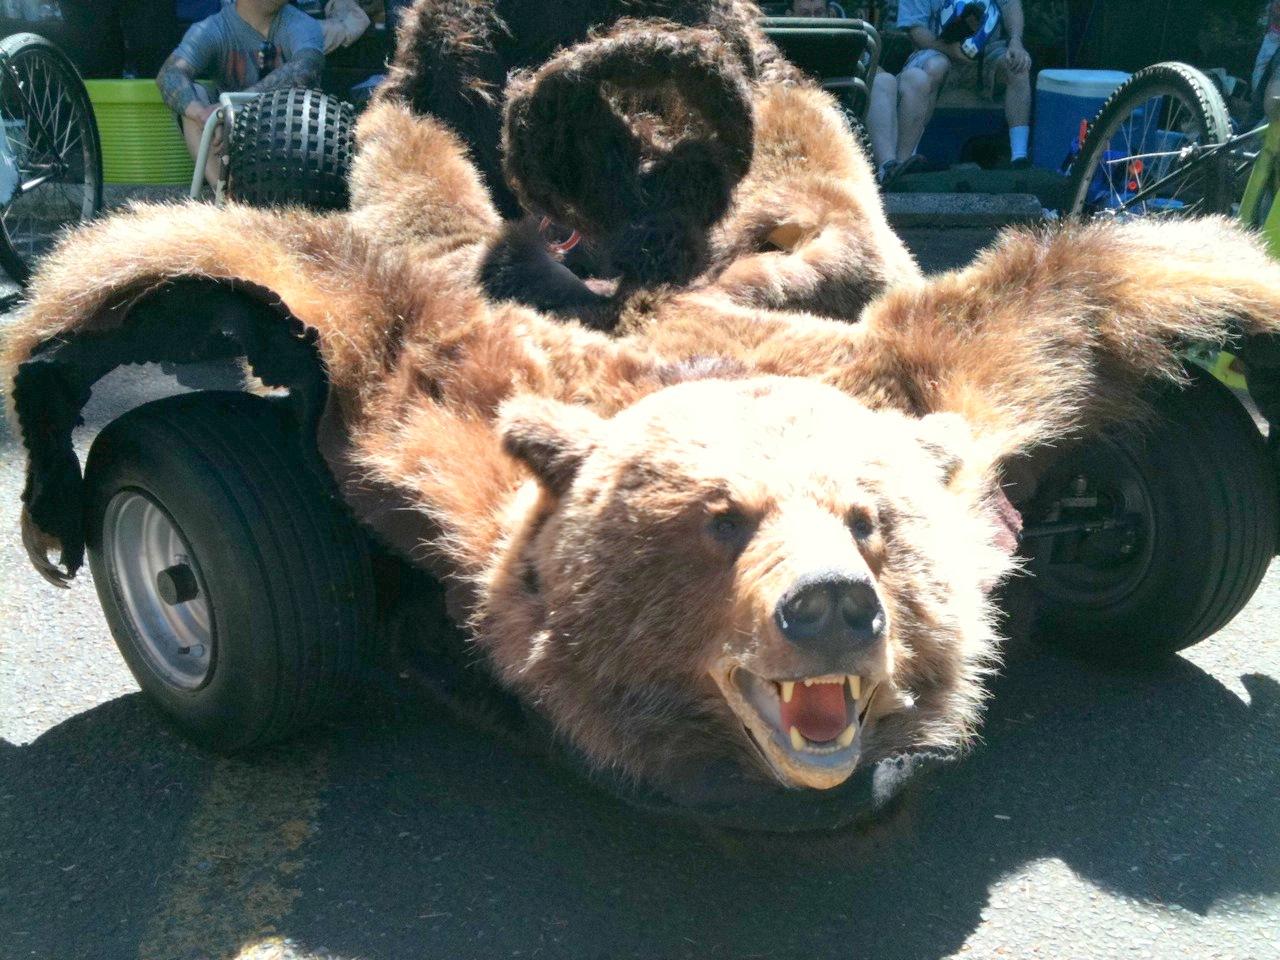 bear+car samedi 18 février 2012. Sal Mineo ...